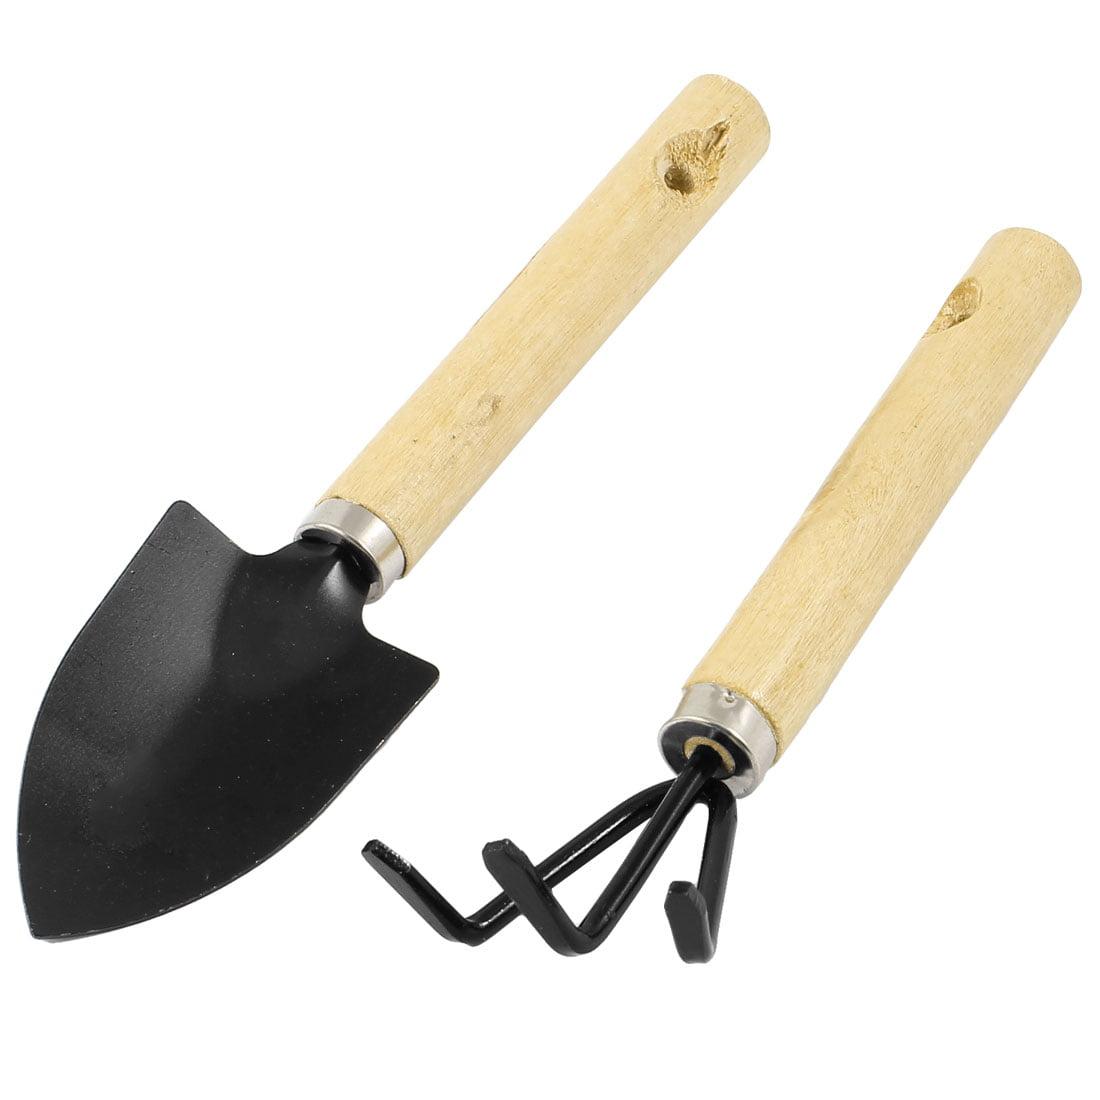 Unique Bargains 2pcs Metal Garden Hand Tools Set Cultivator Digging Trowel Shovel by